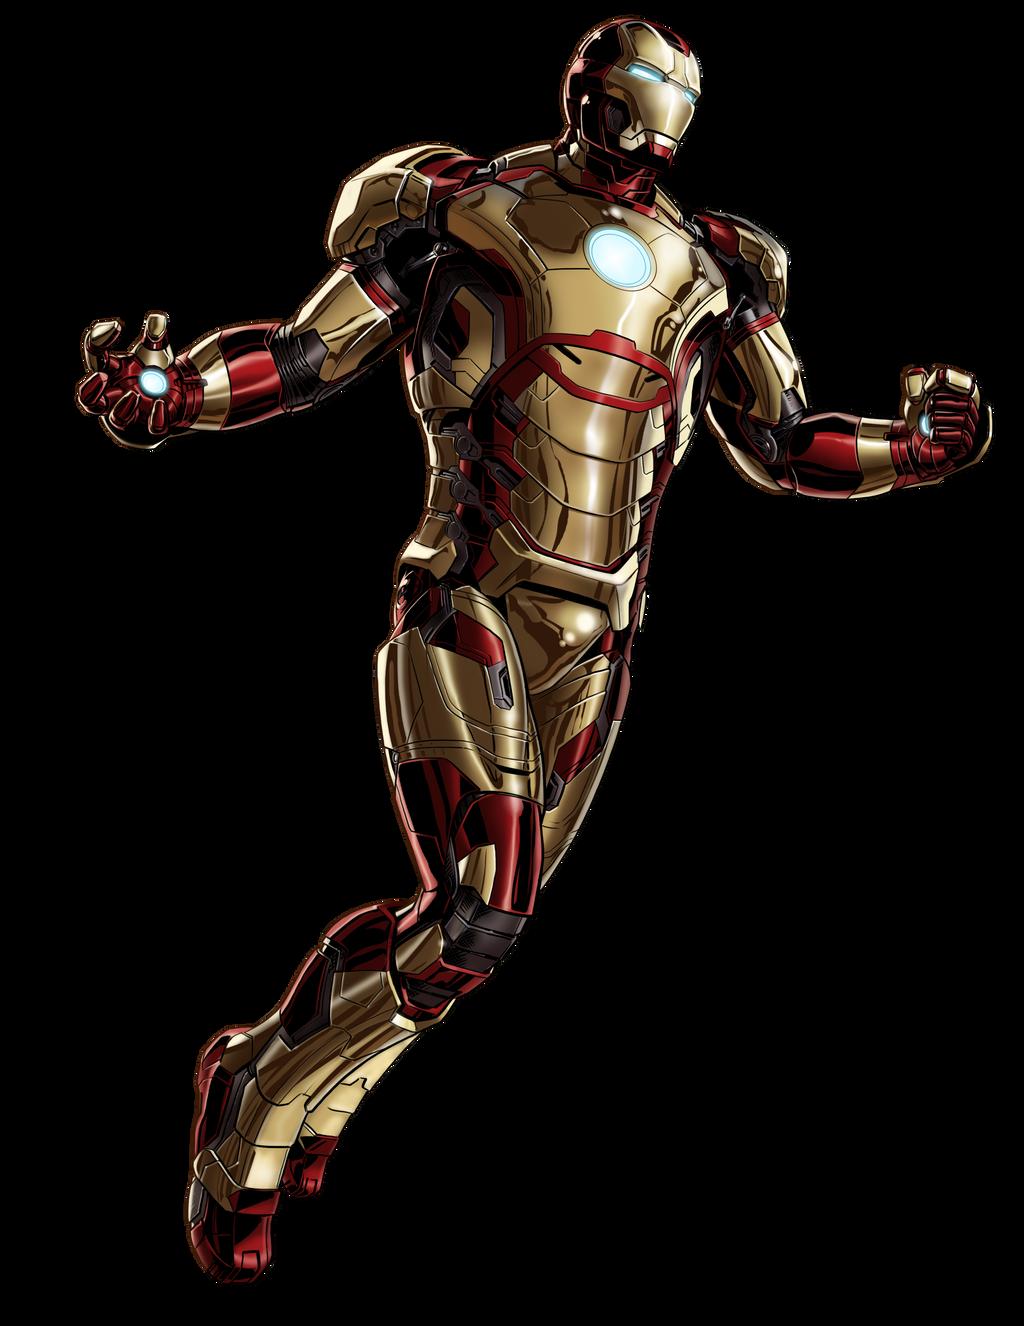 Marvel Avengers Alliance Ironman Mark 42 by ratatrampa87 ...